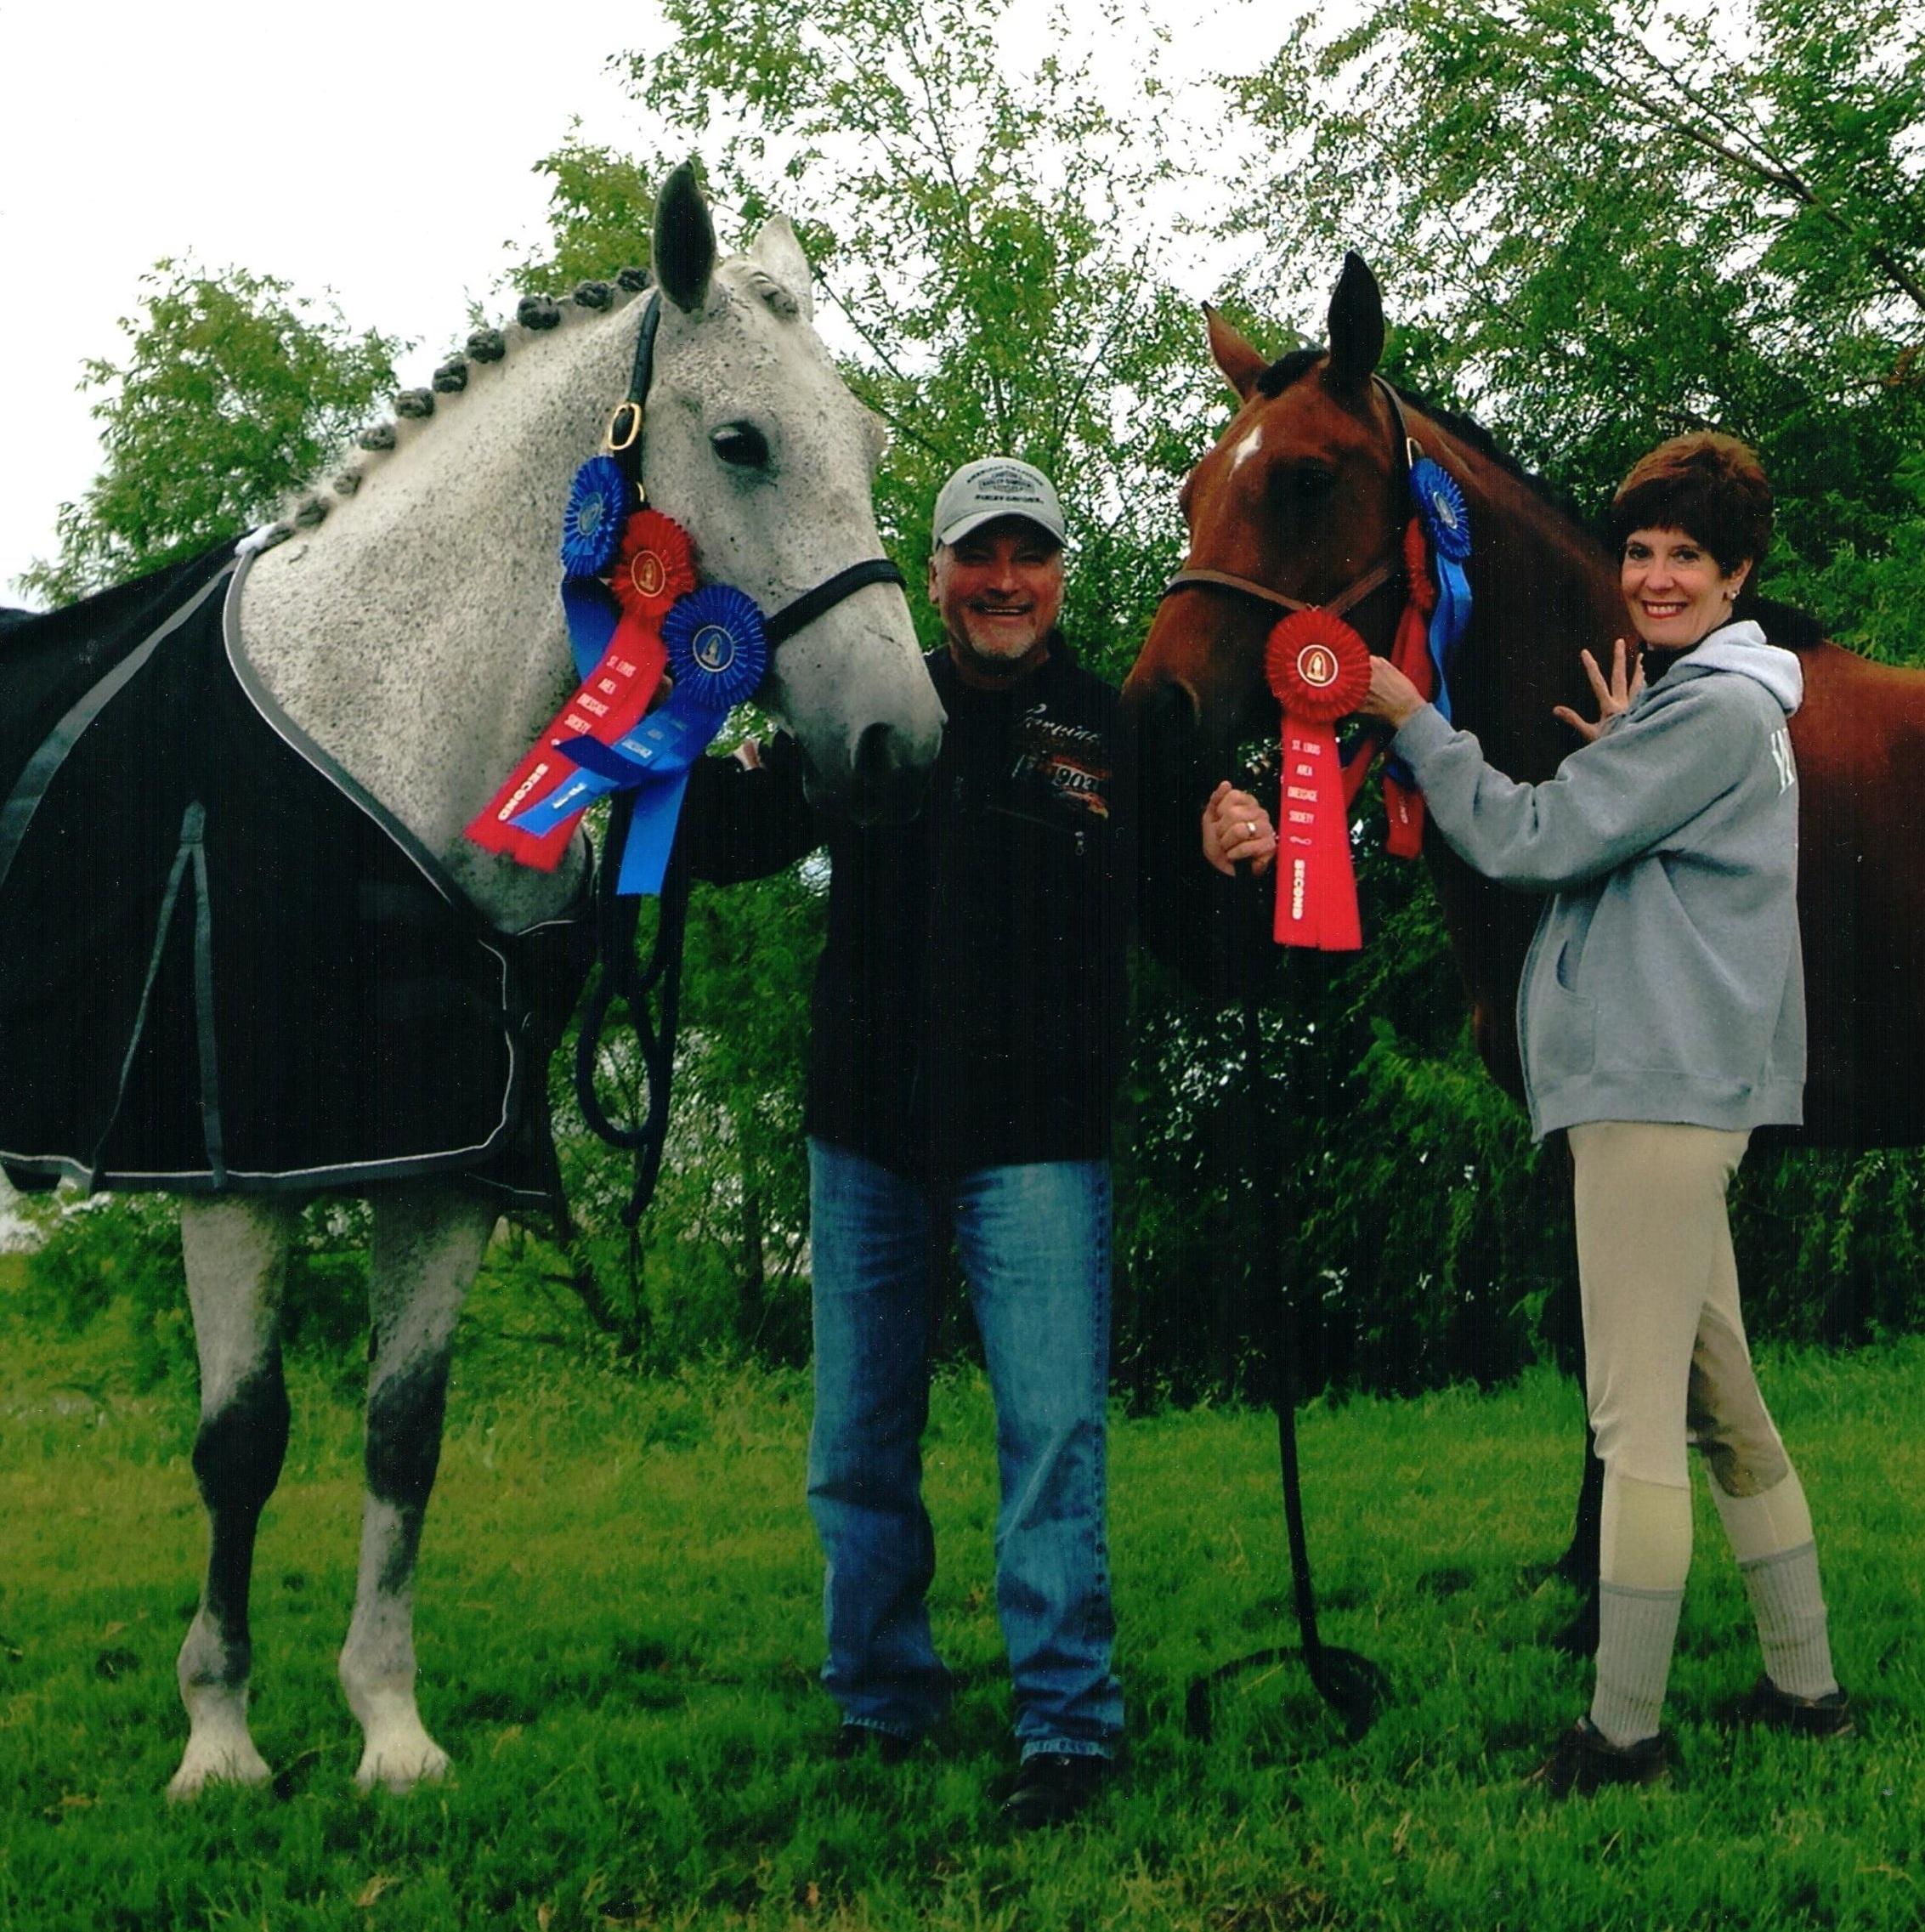 winning+horse.jpg